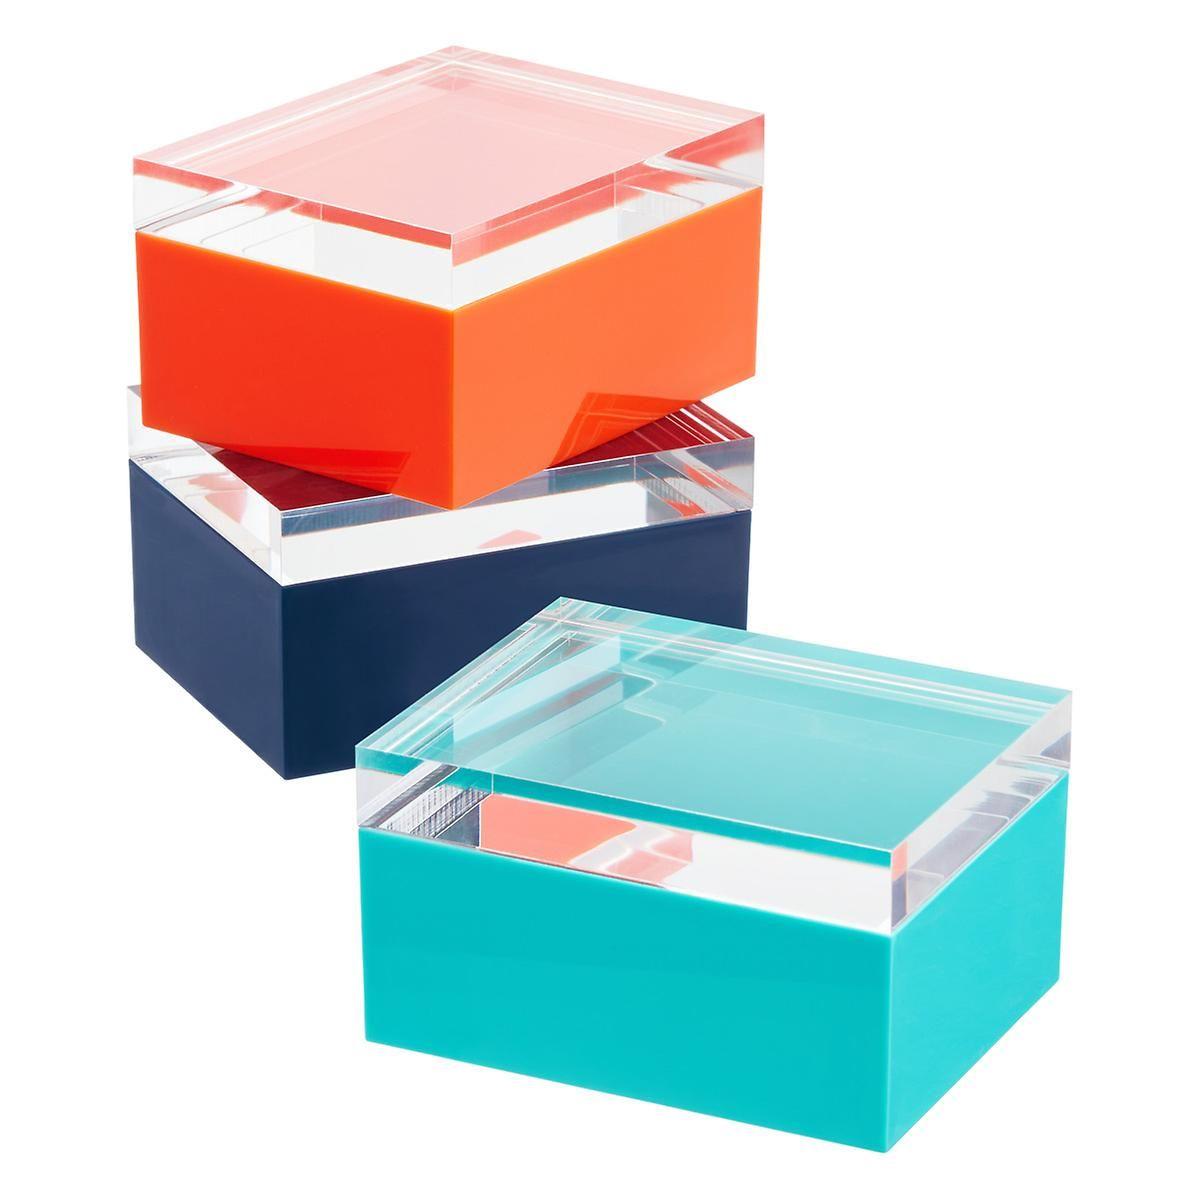 Acrylic lid boxes acrylic box plastic box storage gift